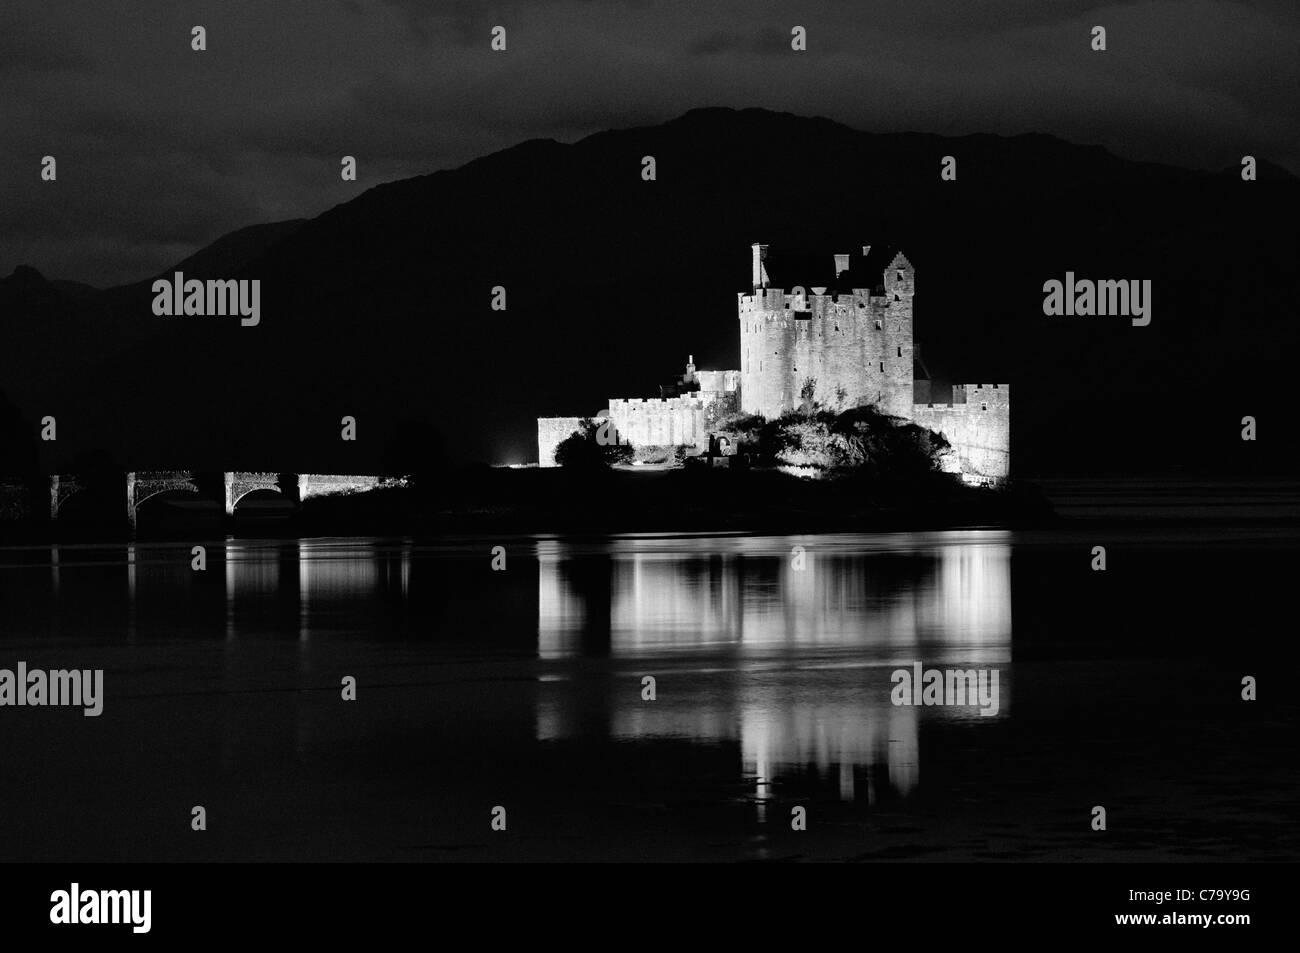 Black and White Photo of Eilean Donan Castle on Loch Duich at Twilight - Near Dornie, Scotland - Stock Image